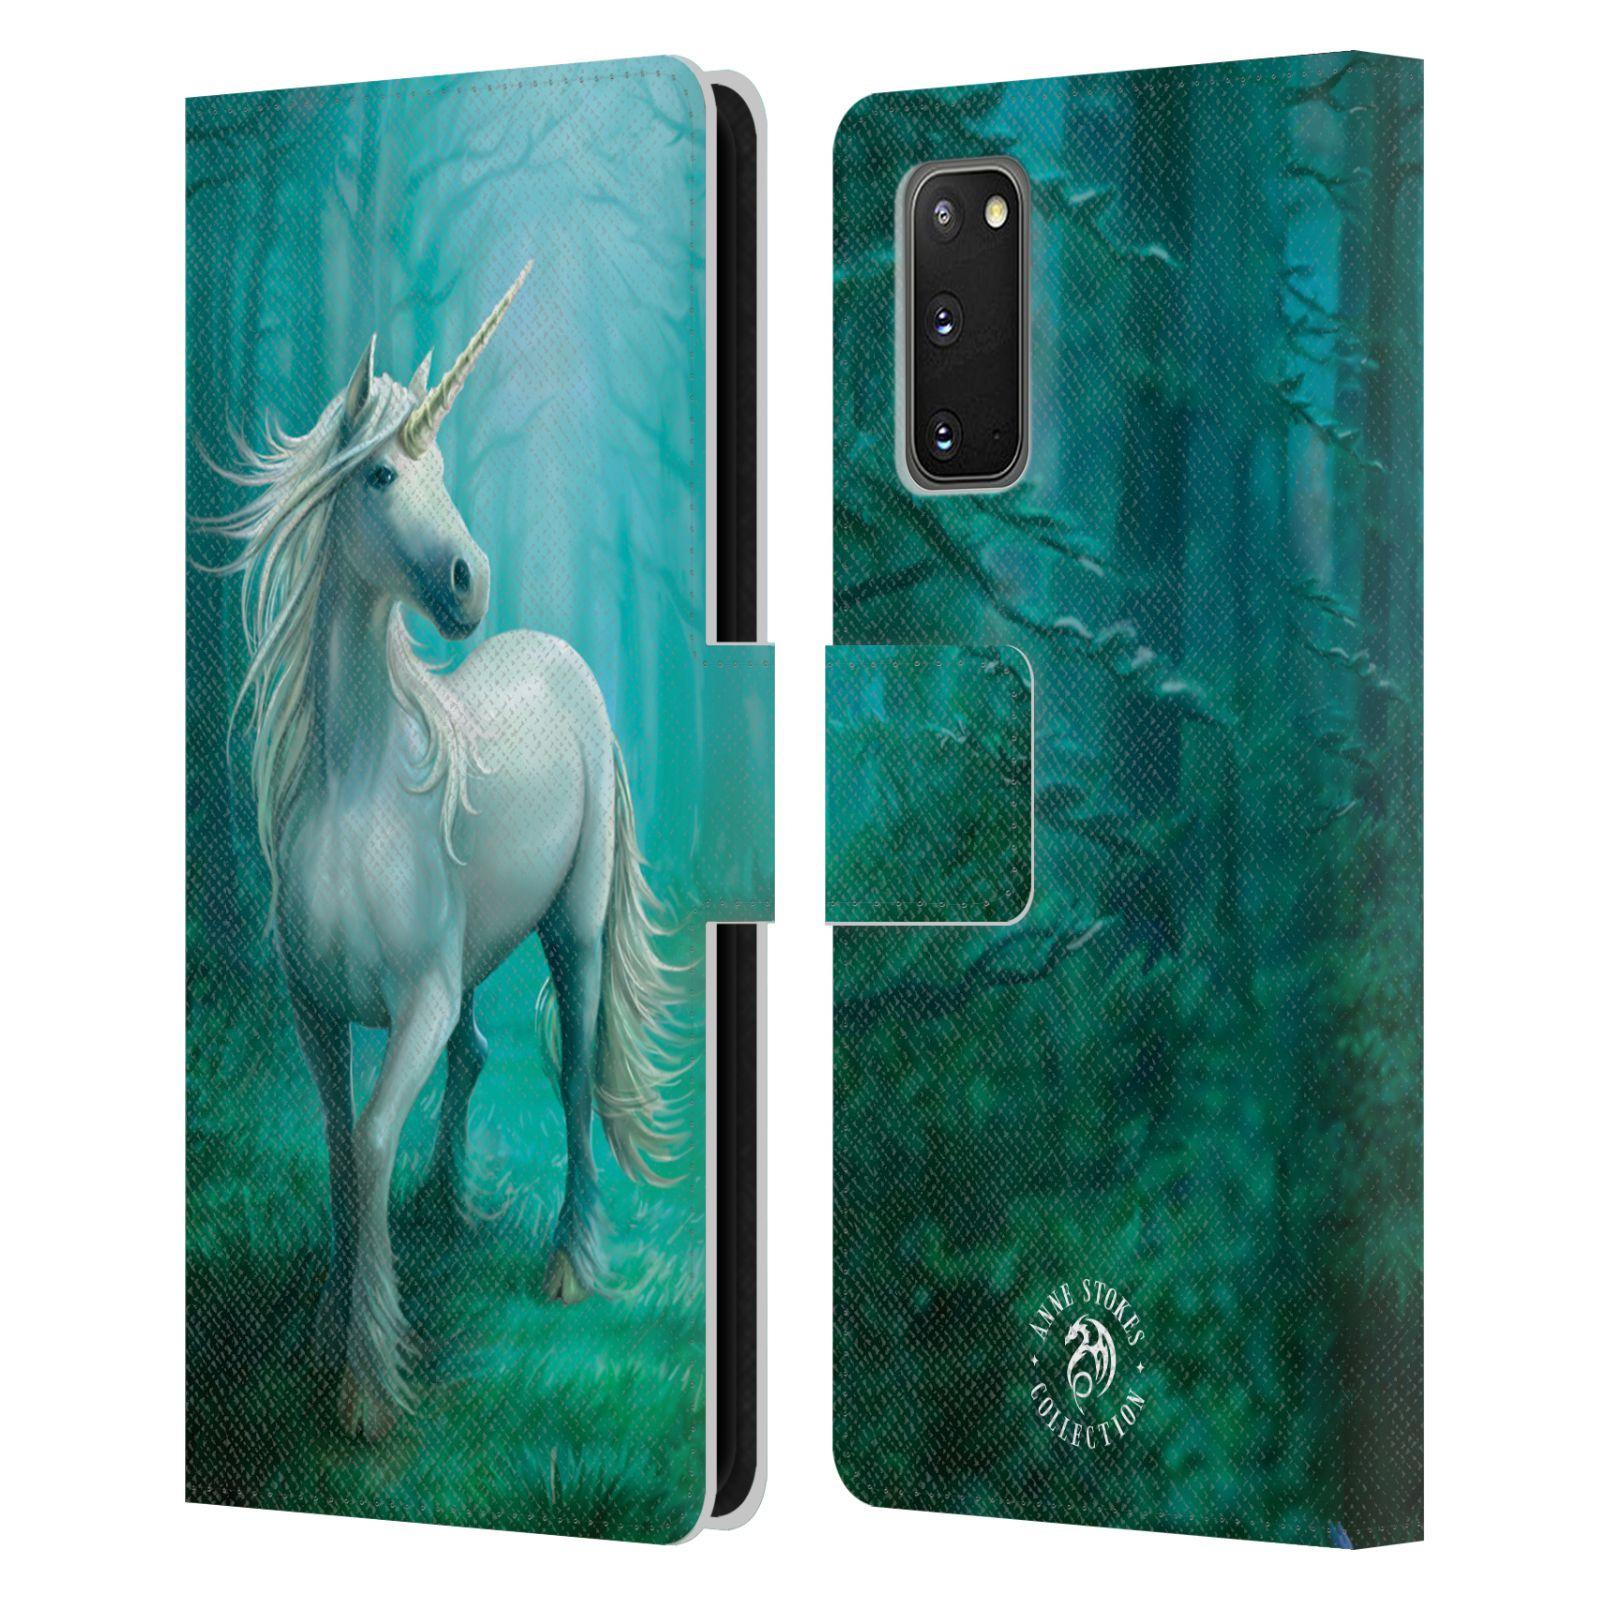 Pouzdro na mobil Samsung Galaxy S20 - Head Case - fantasy - jednorožec v lese